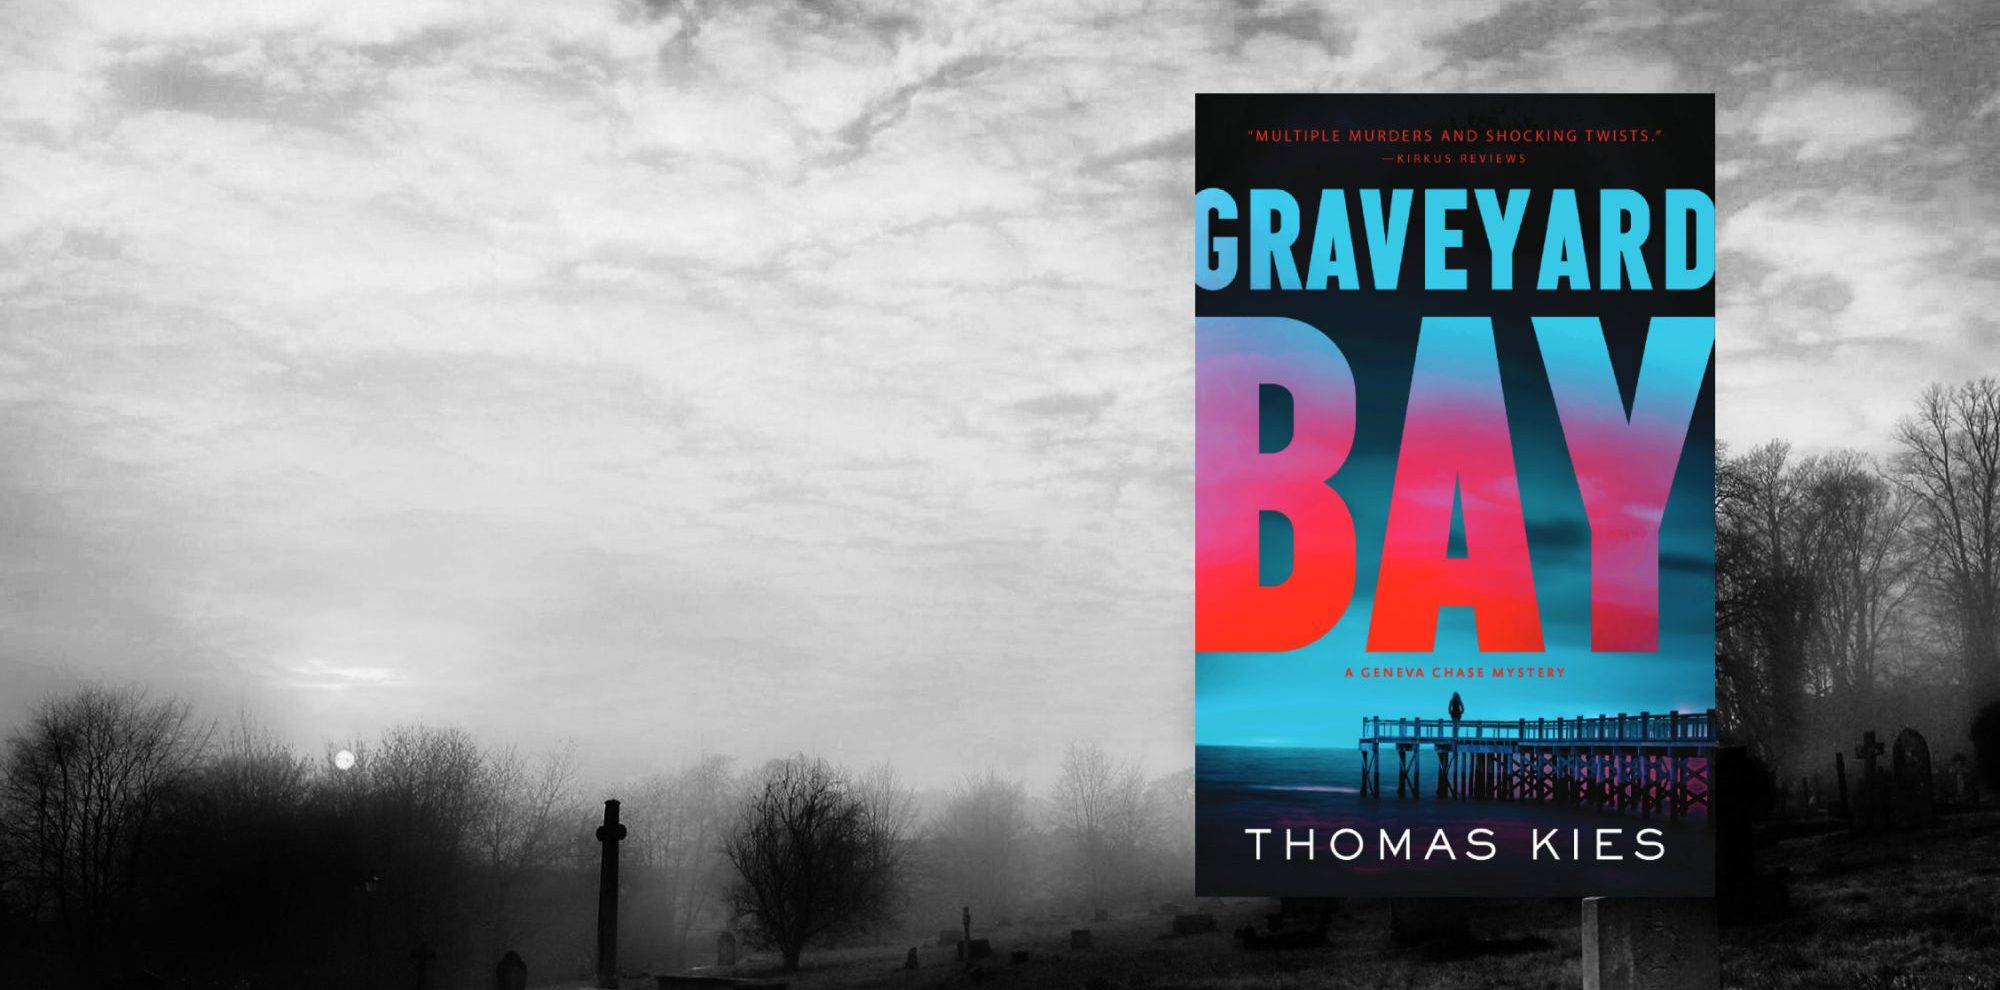 graveyard bay cover art